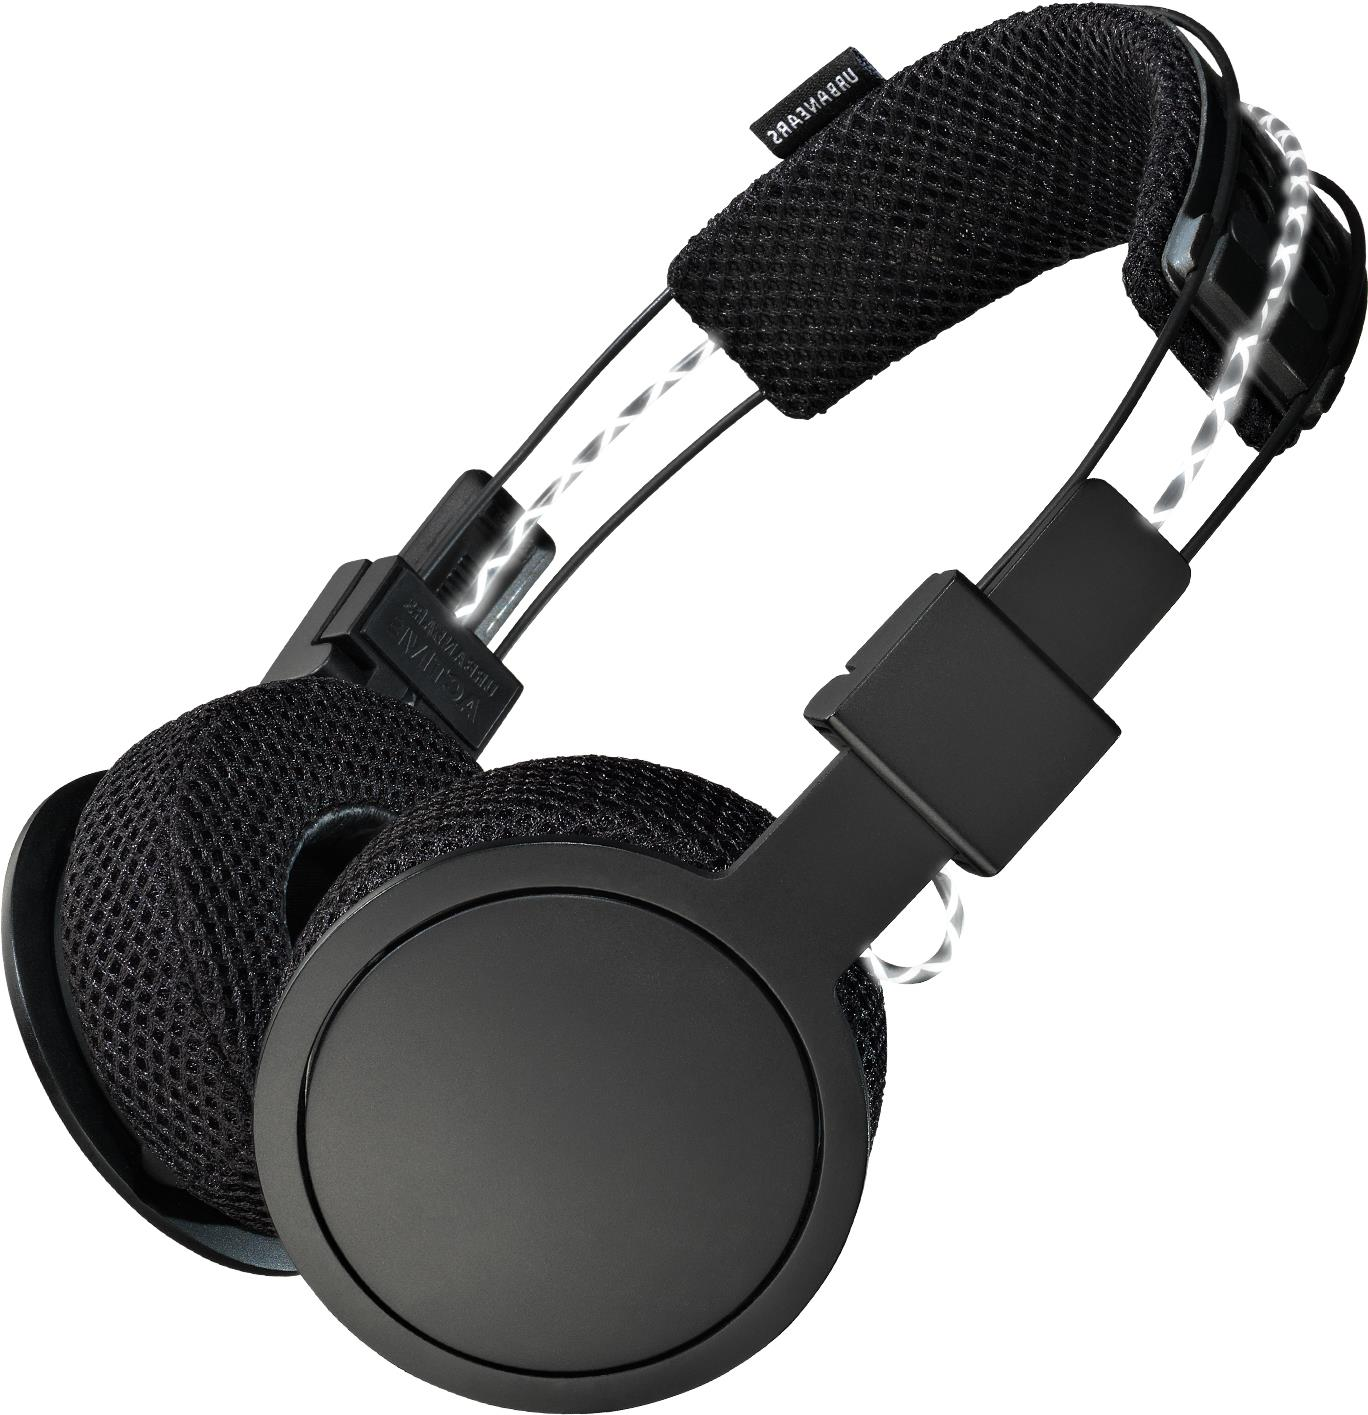 Audiozubehör - Urbanears Hellas Kopfhörer mit Mikrofon On Ear kabellos 3,5 mm Stecker schwarzer Gürtel  - Onlineshop JACOB Elektronik